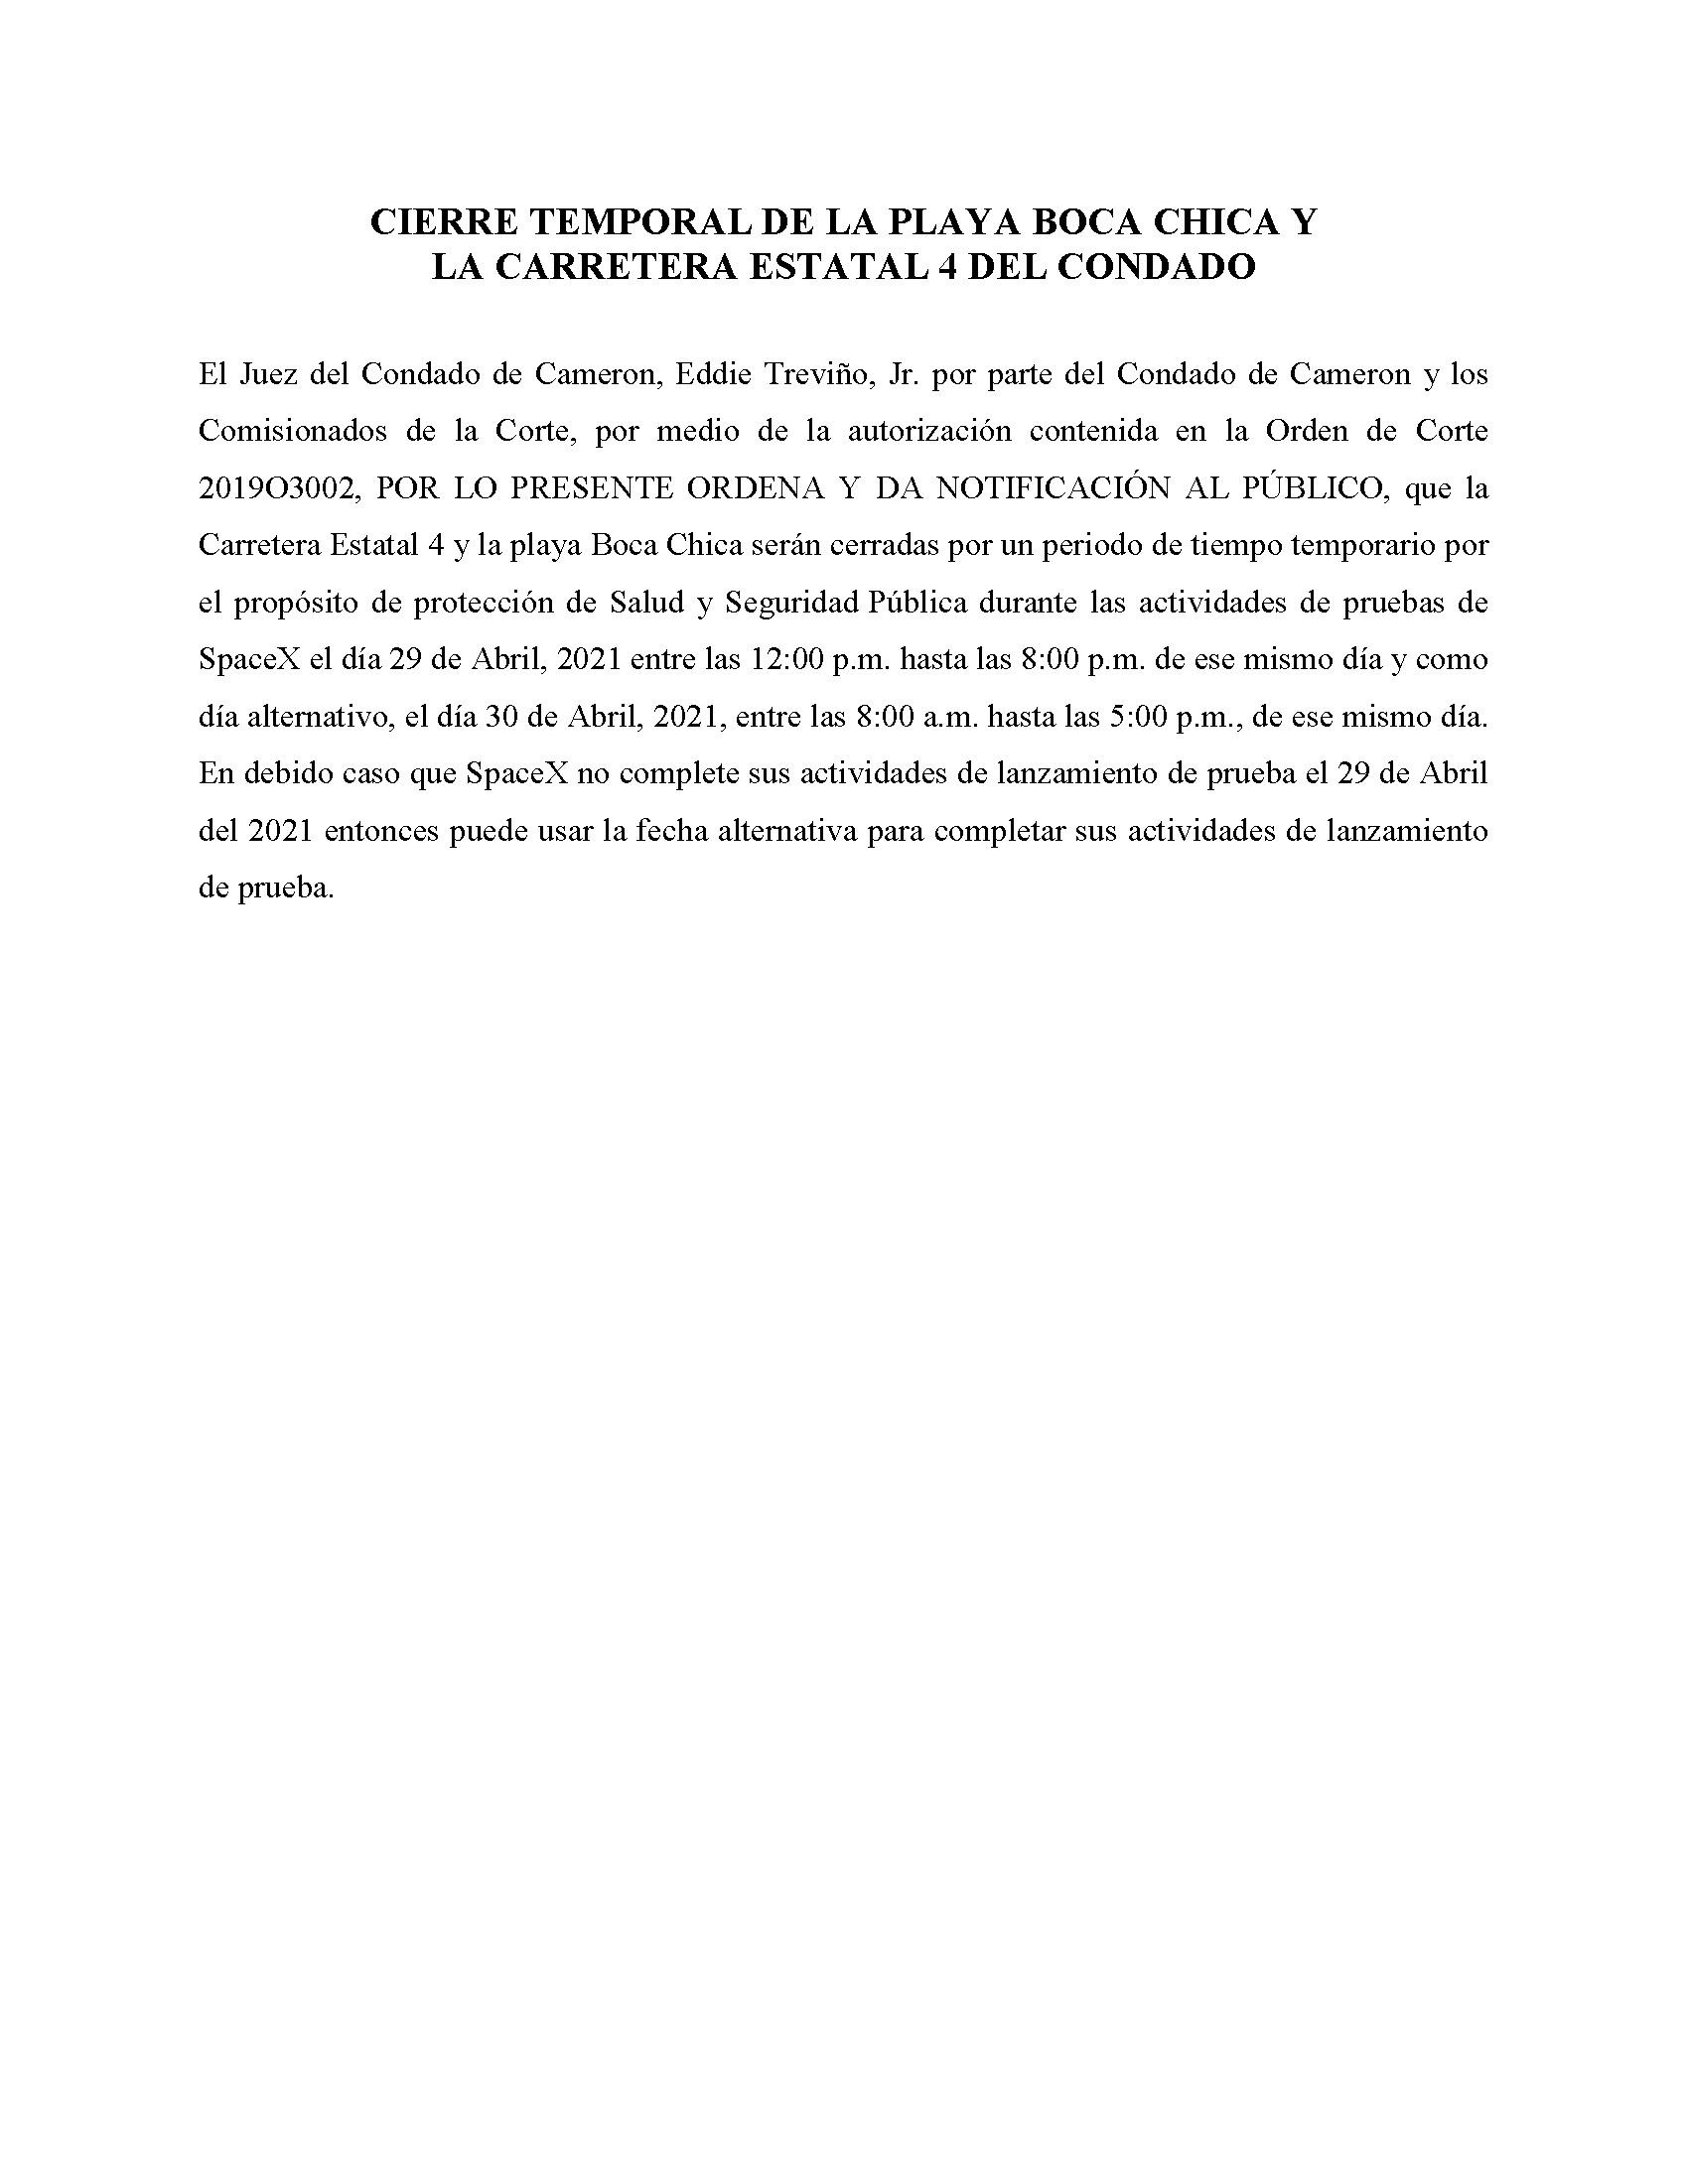 ORDER.CLOSURE OF HIGHWAY 4 Y LA PLAYA BOCA CHICA.SPANISH.04.29.2021